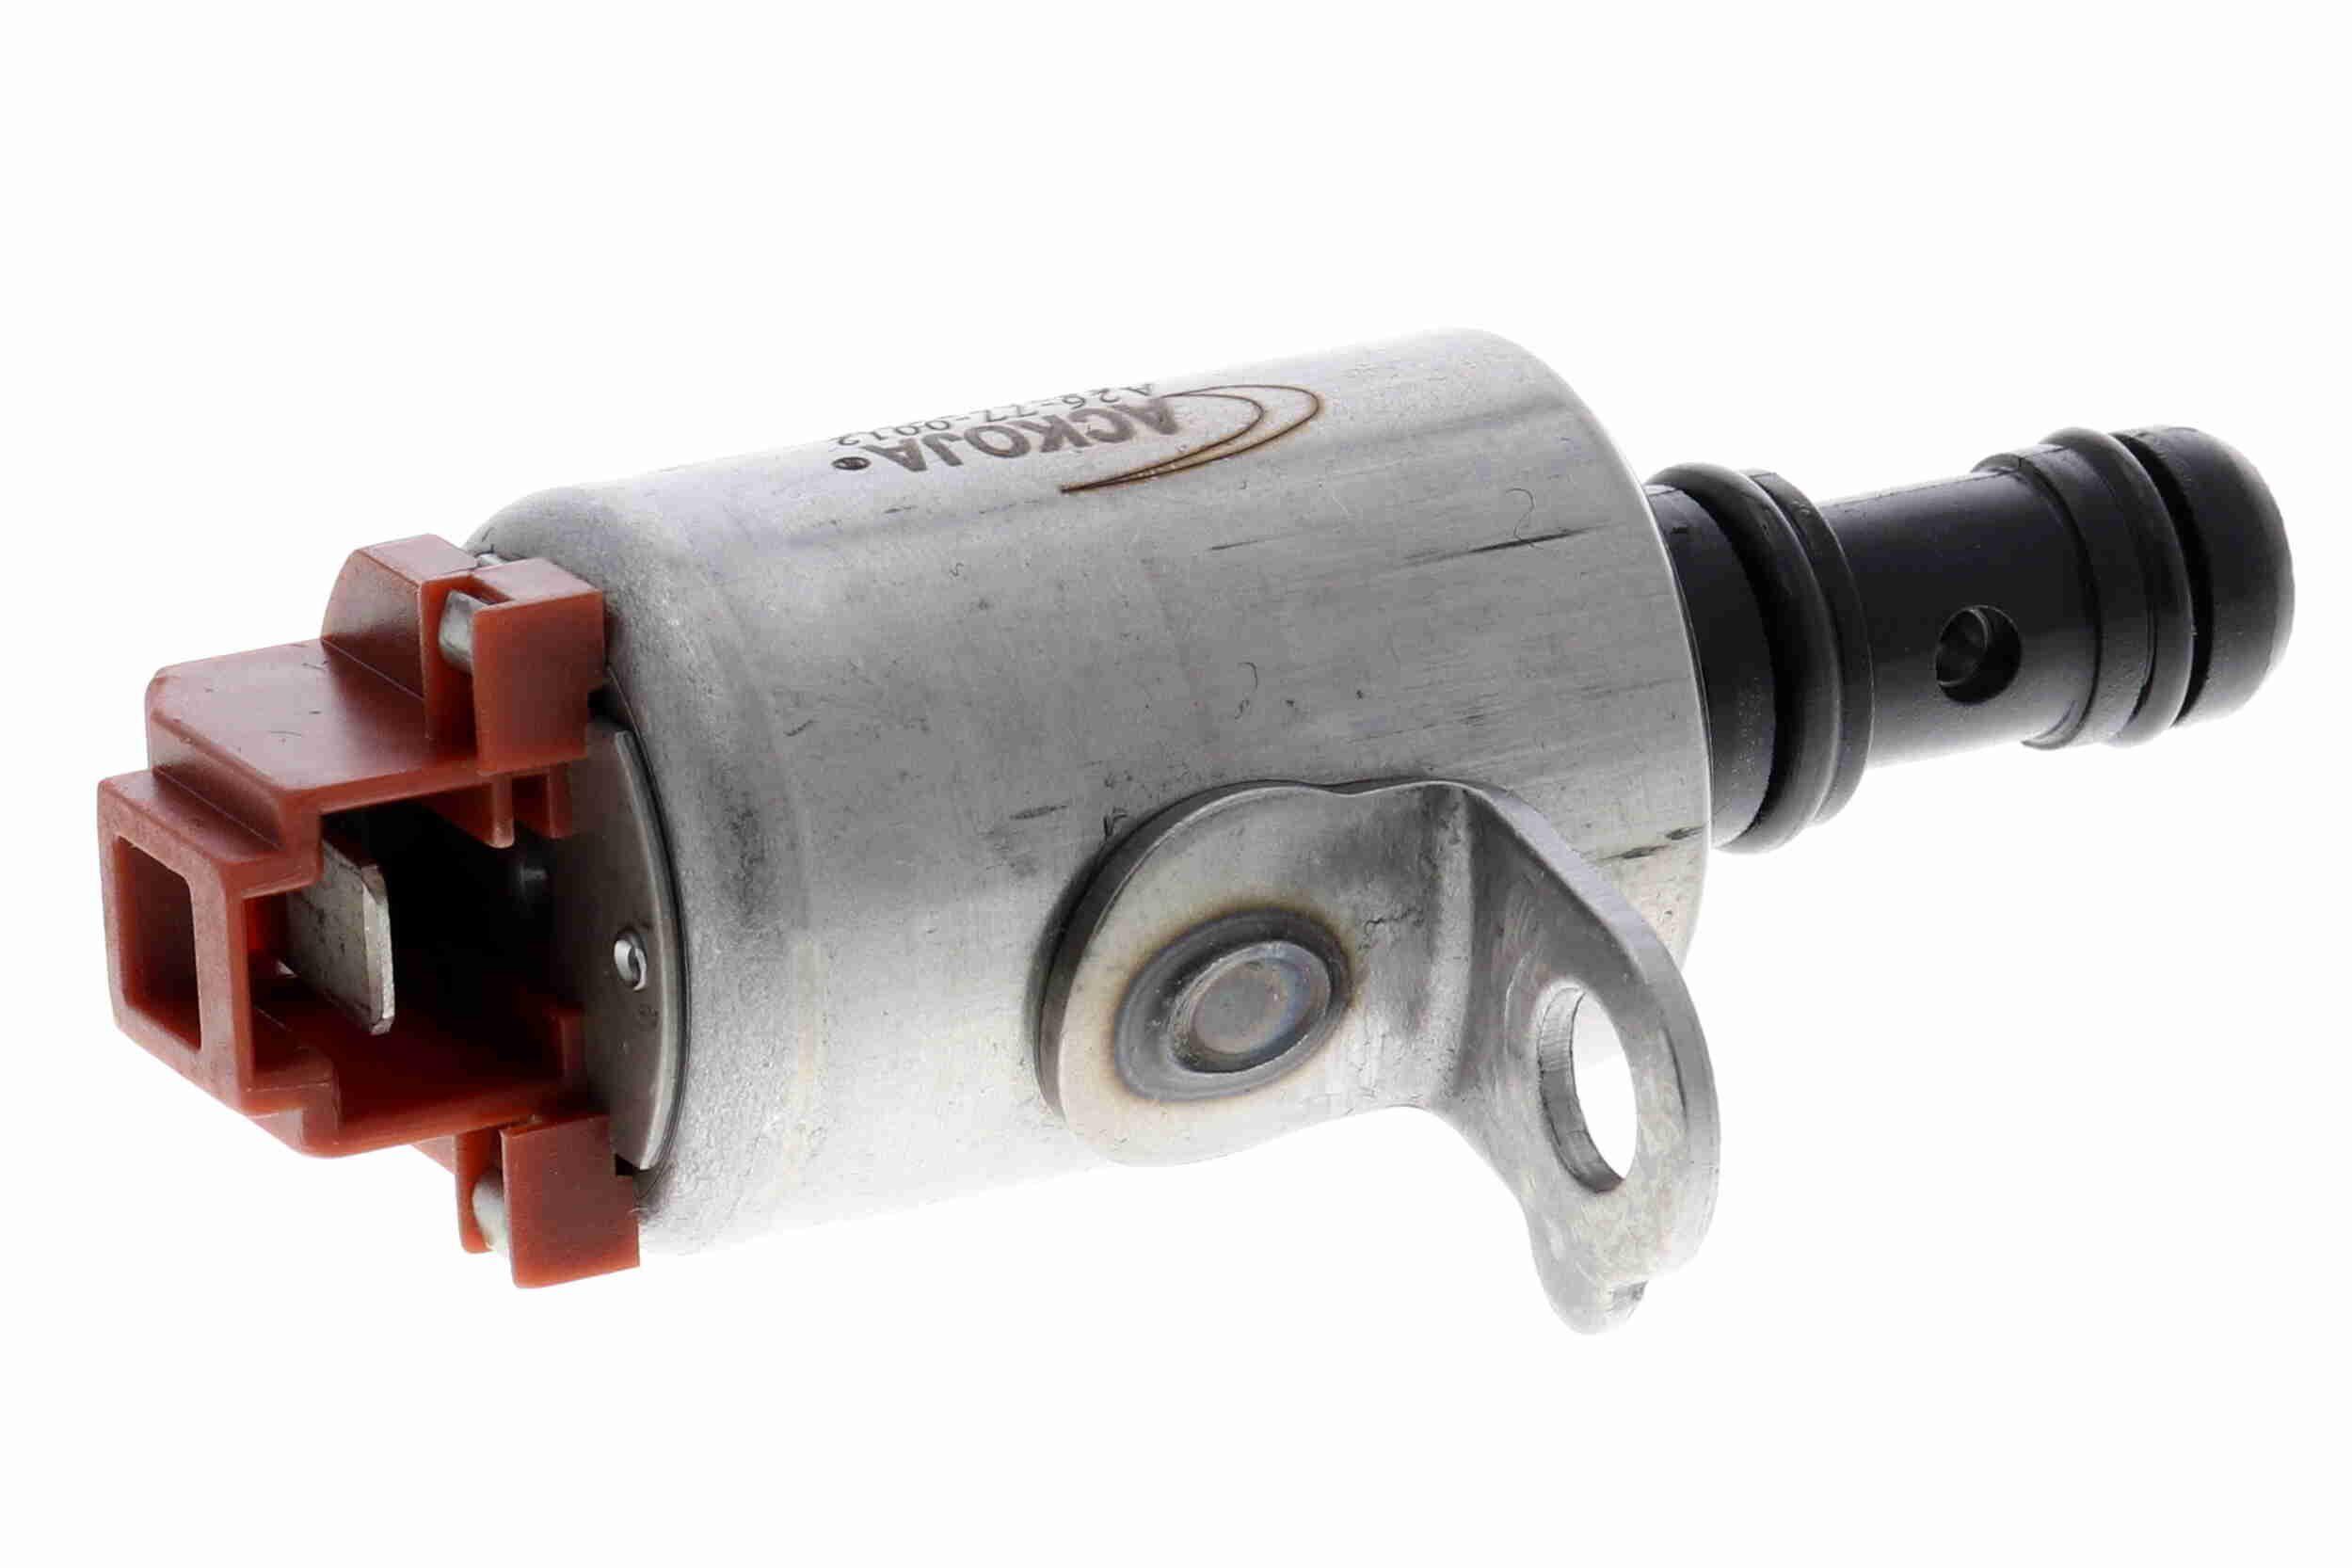 A26-77-0012 ACKOJA Schaltventil, Automatikgetriebe A26-77-0012 günstig kaufen